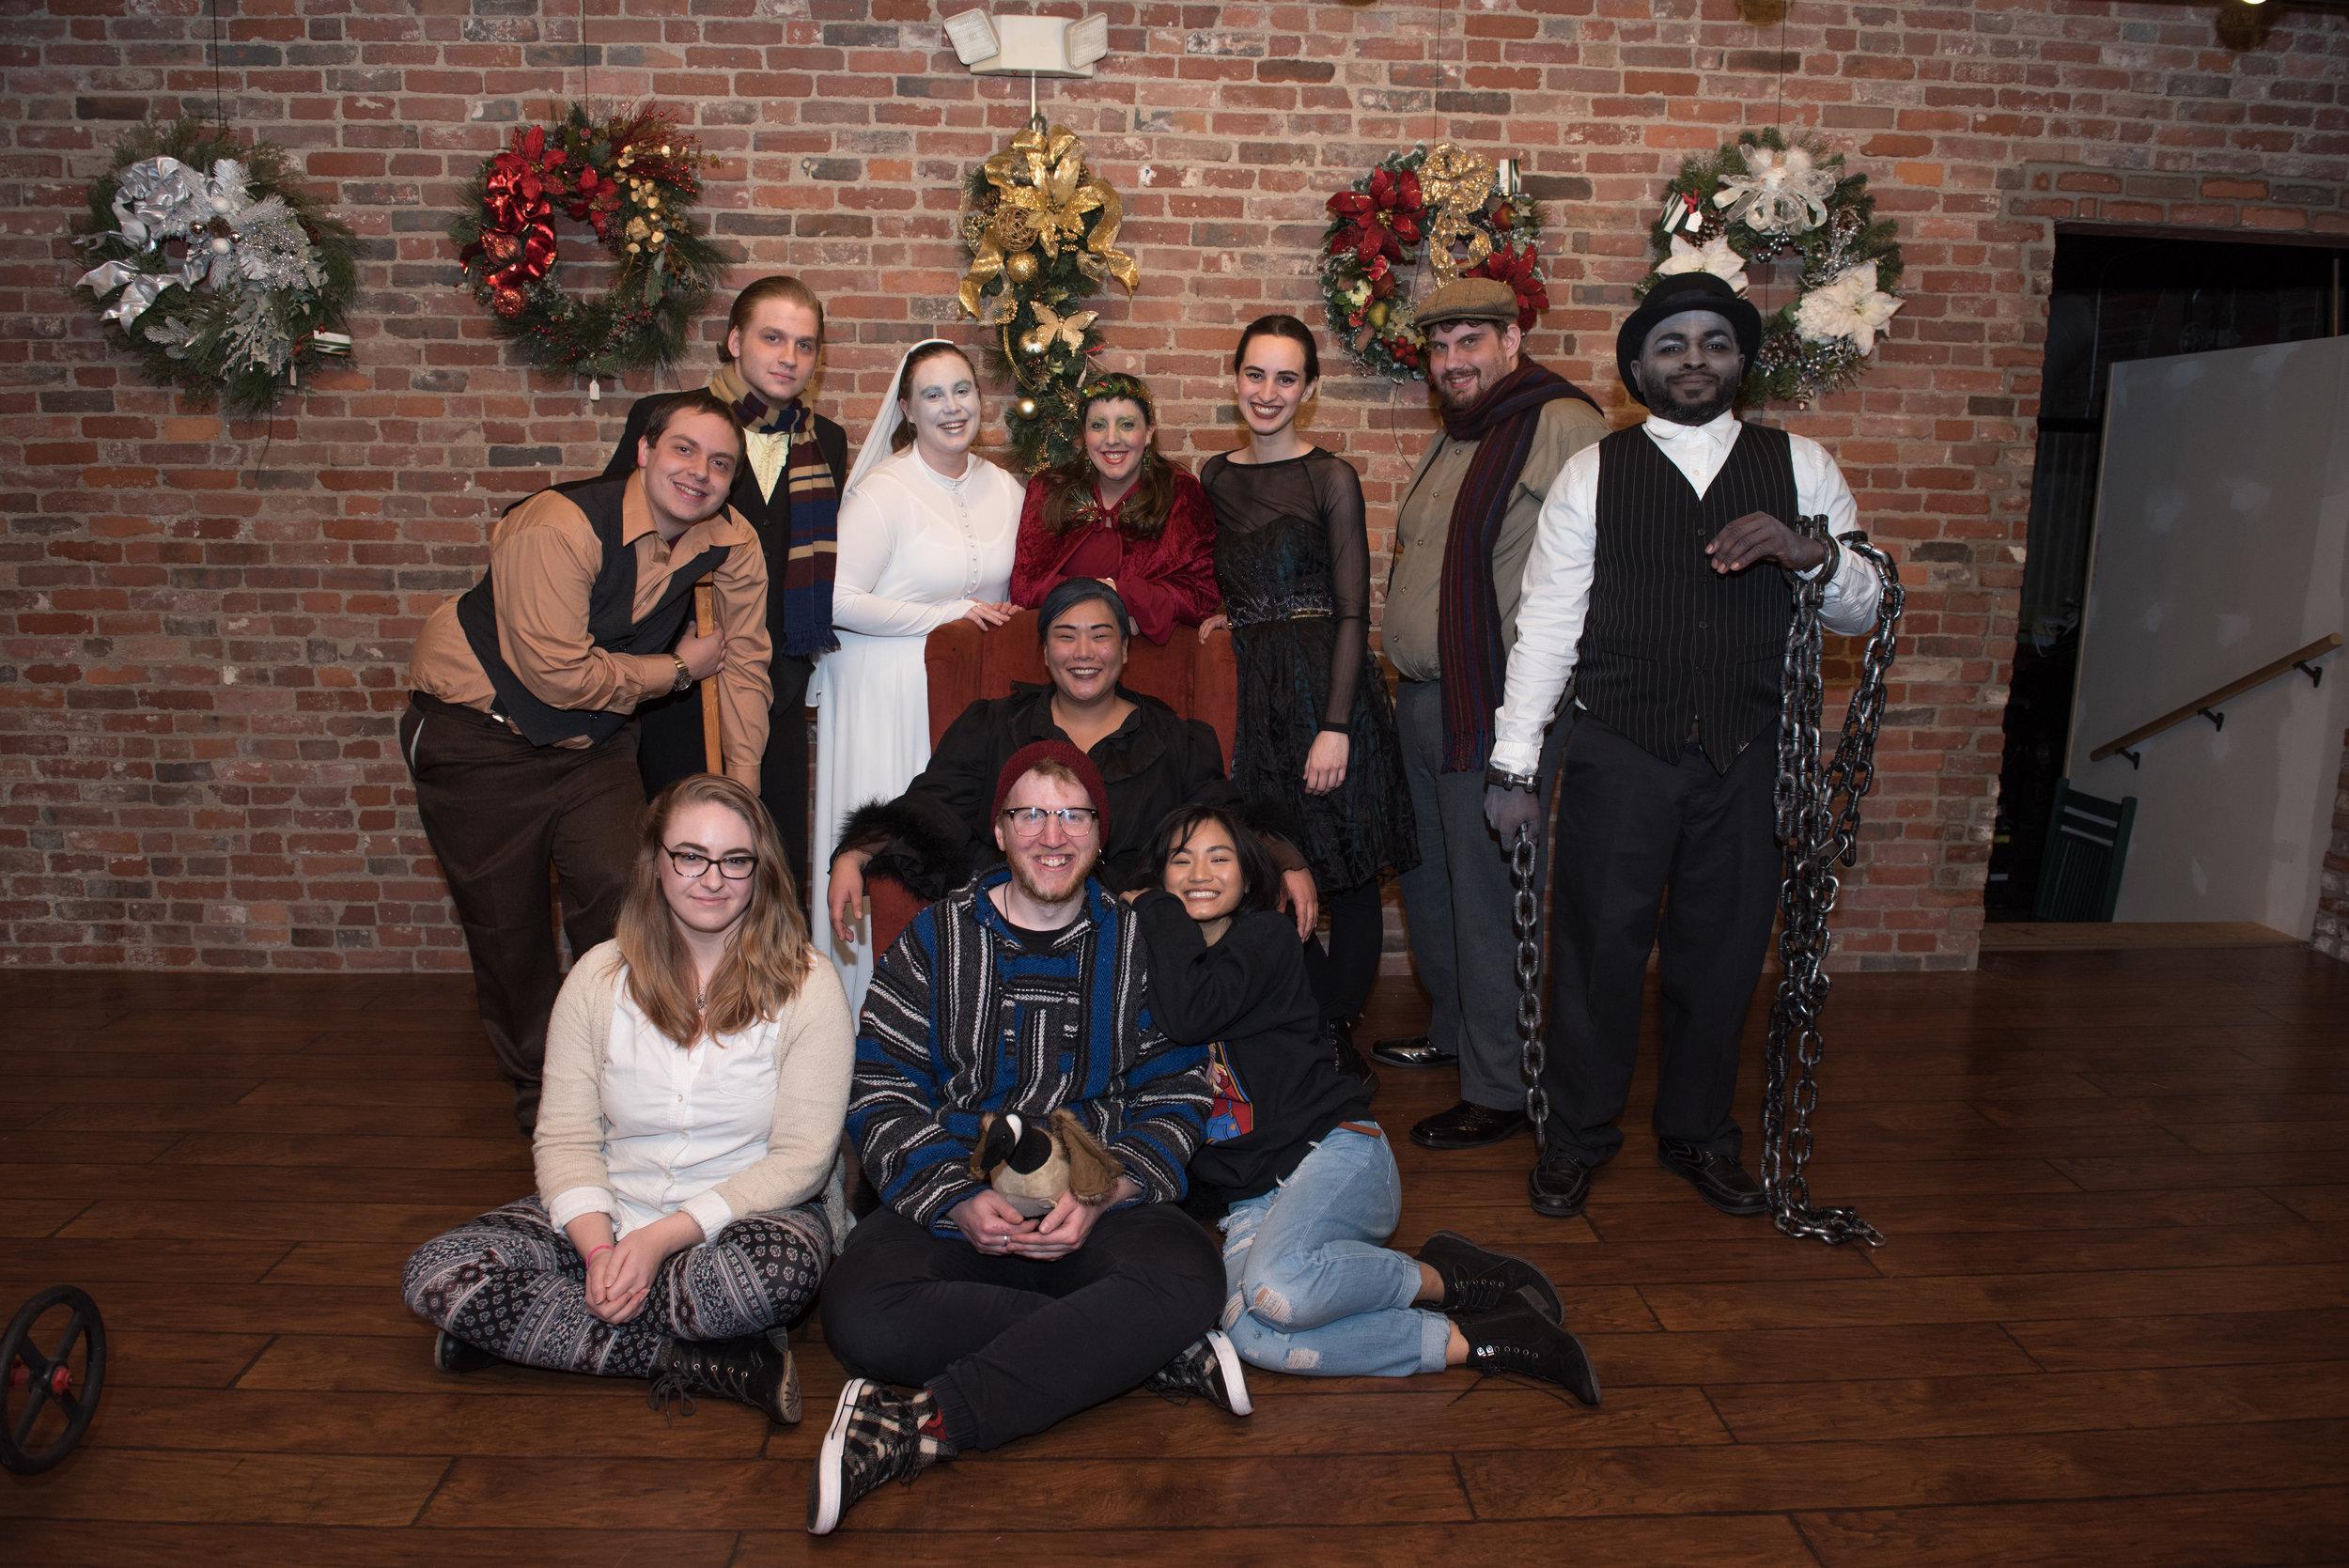 A Christmas Carol - Dec. 9th-10th & 14th-17th 2017